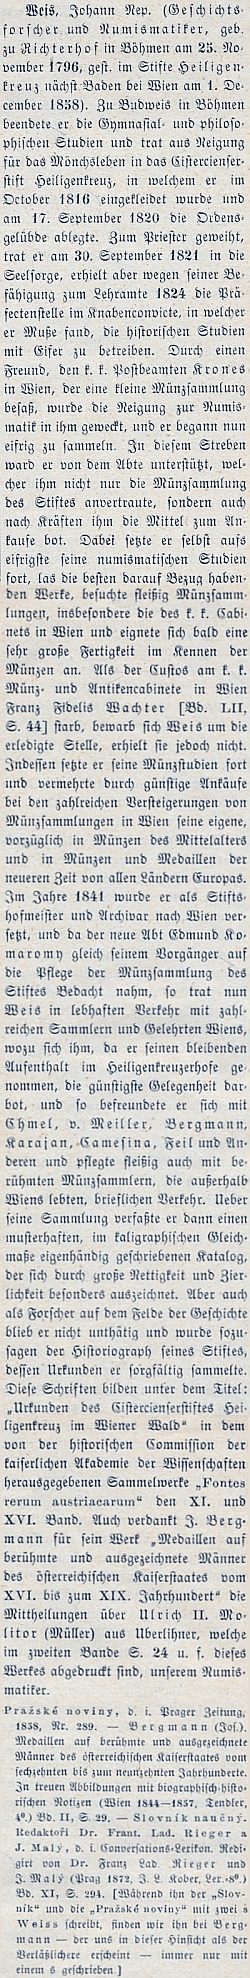 Jeho životopis na stránkách Wurzbachova lexikonu významných rakouských osobností